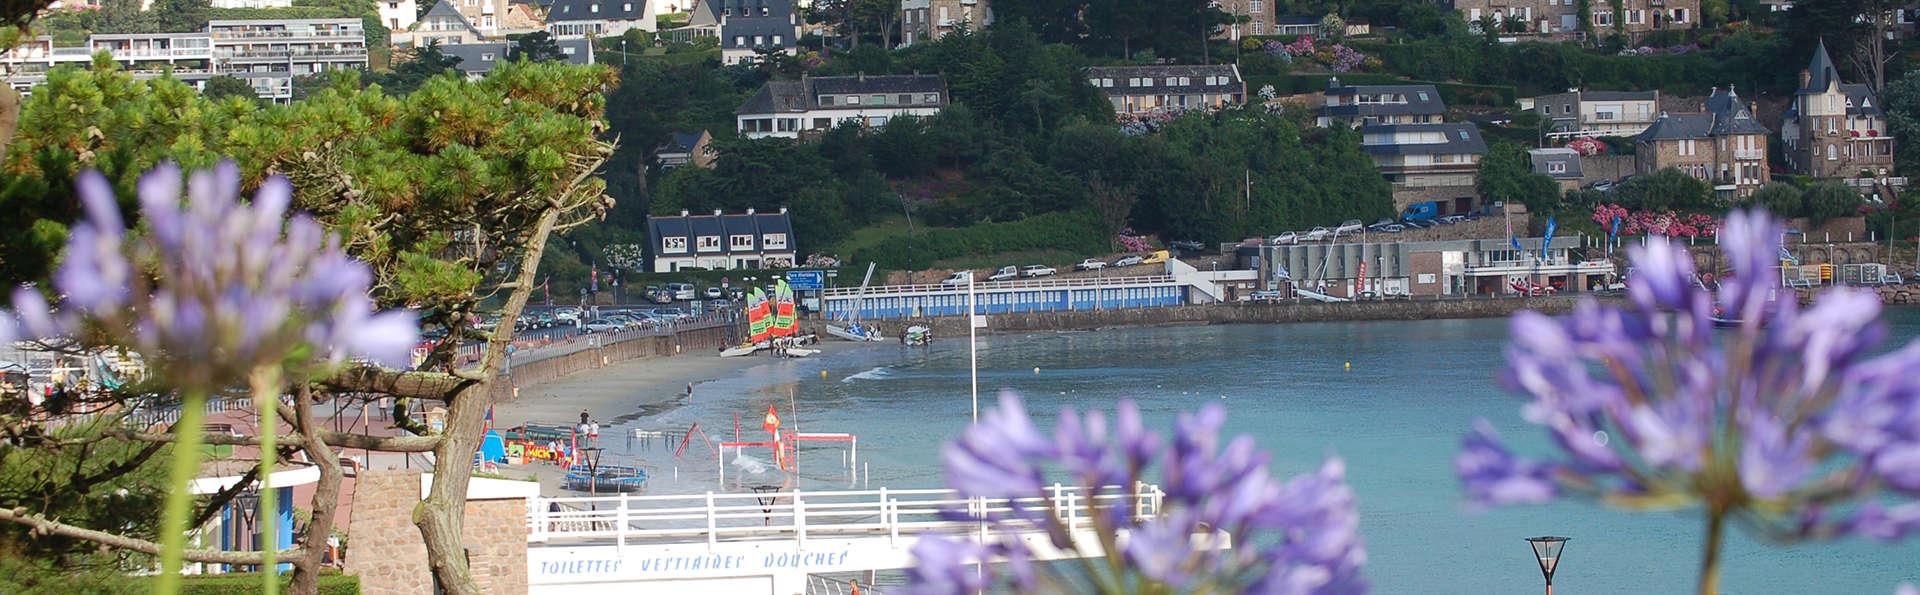 Best Western Les Bains Hotel et SPA  - EDIT_NEW_Destination.jpg